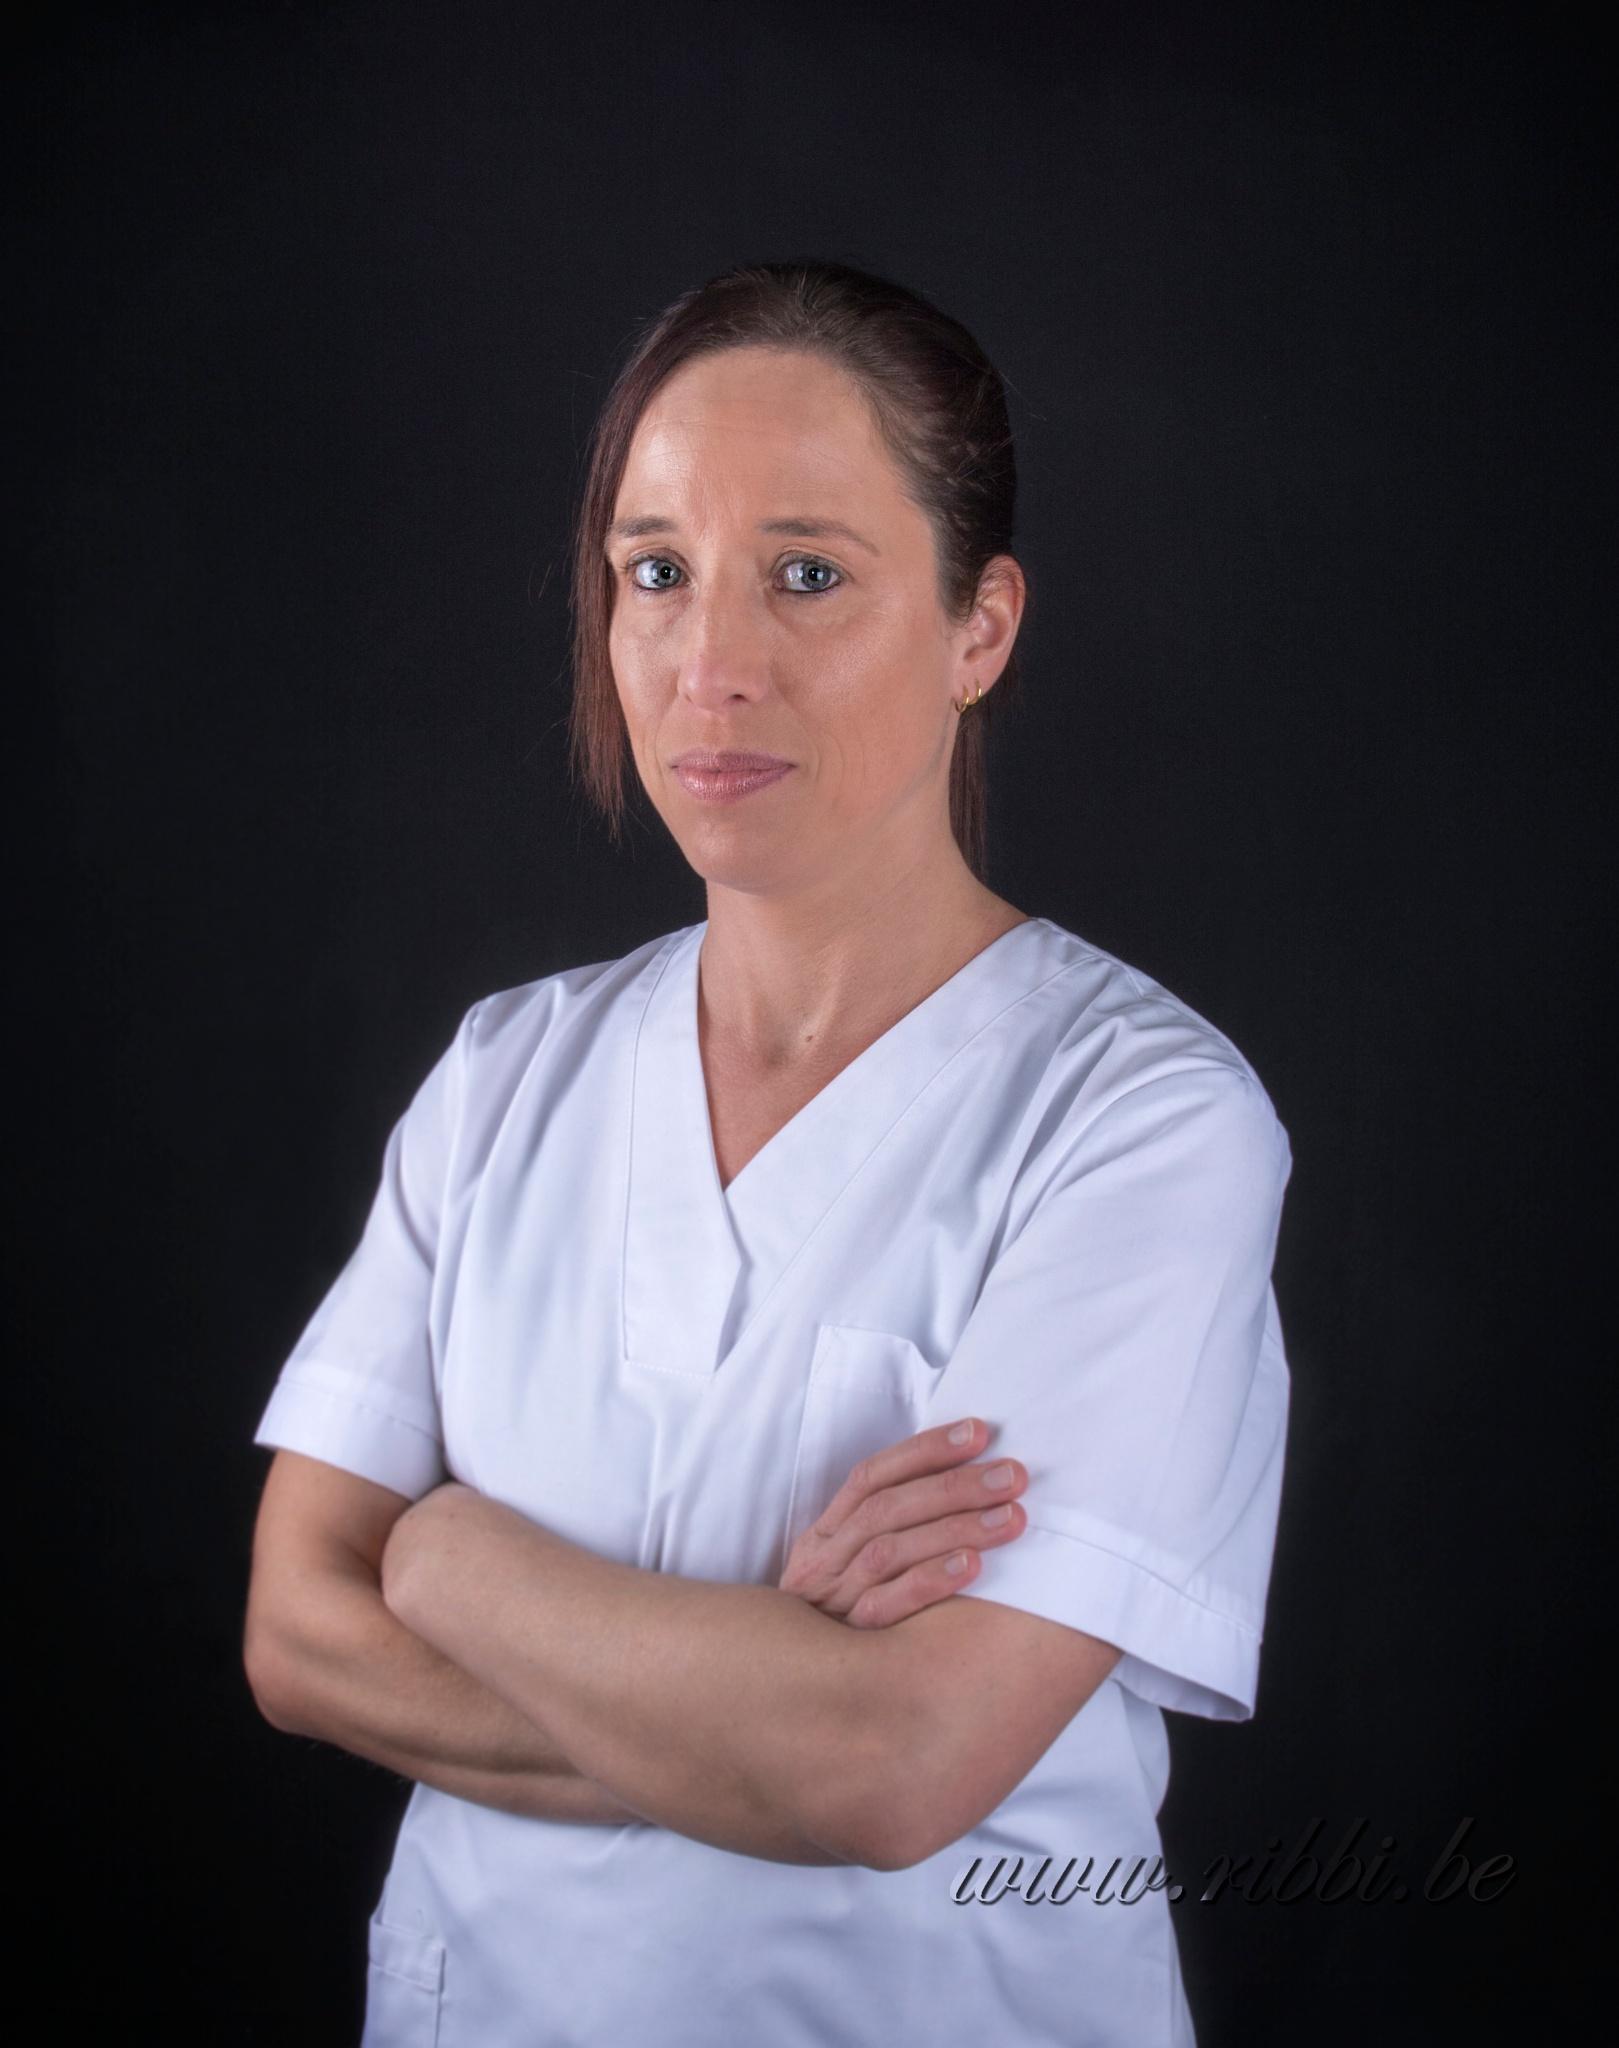 Nurse  by Ribbi